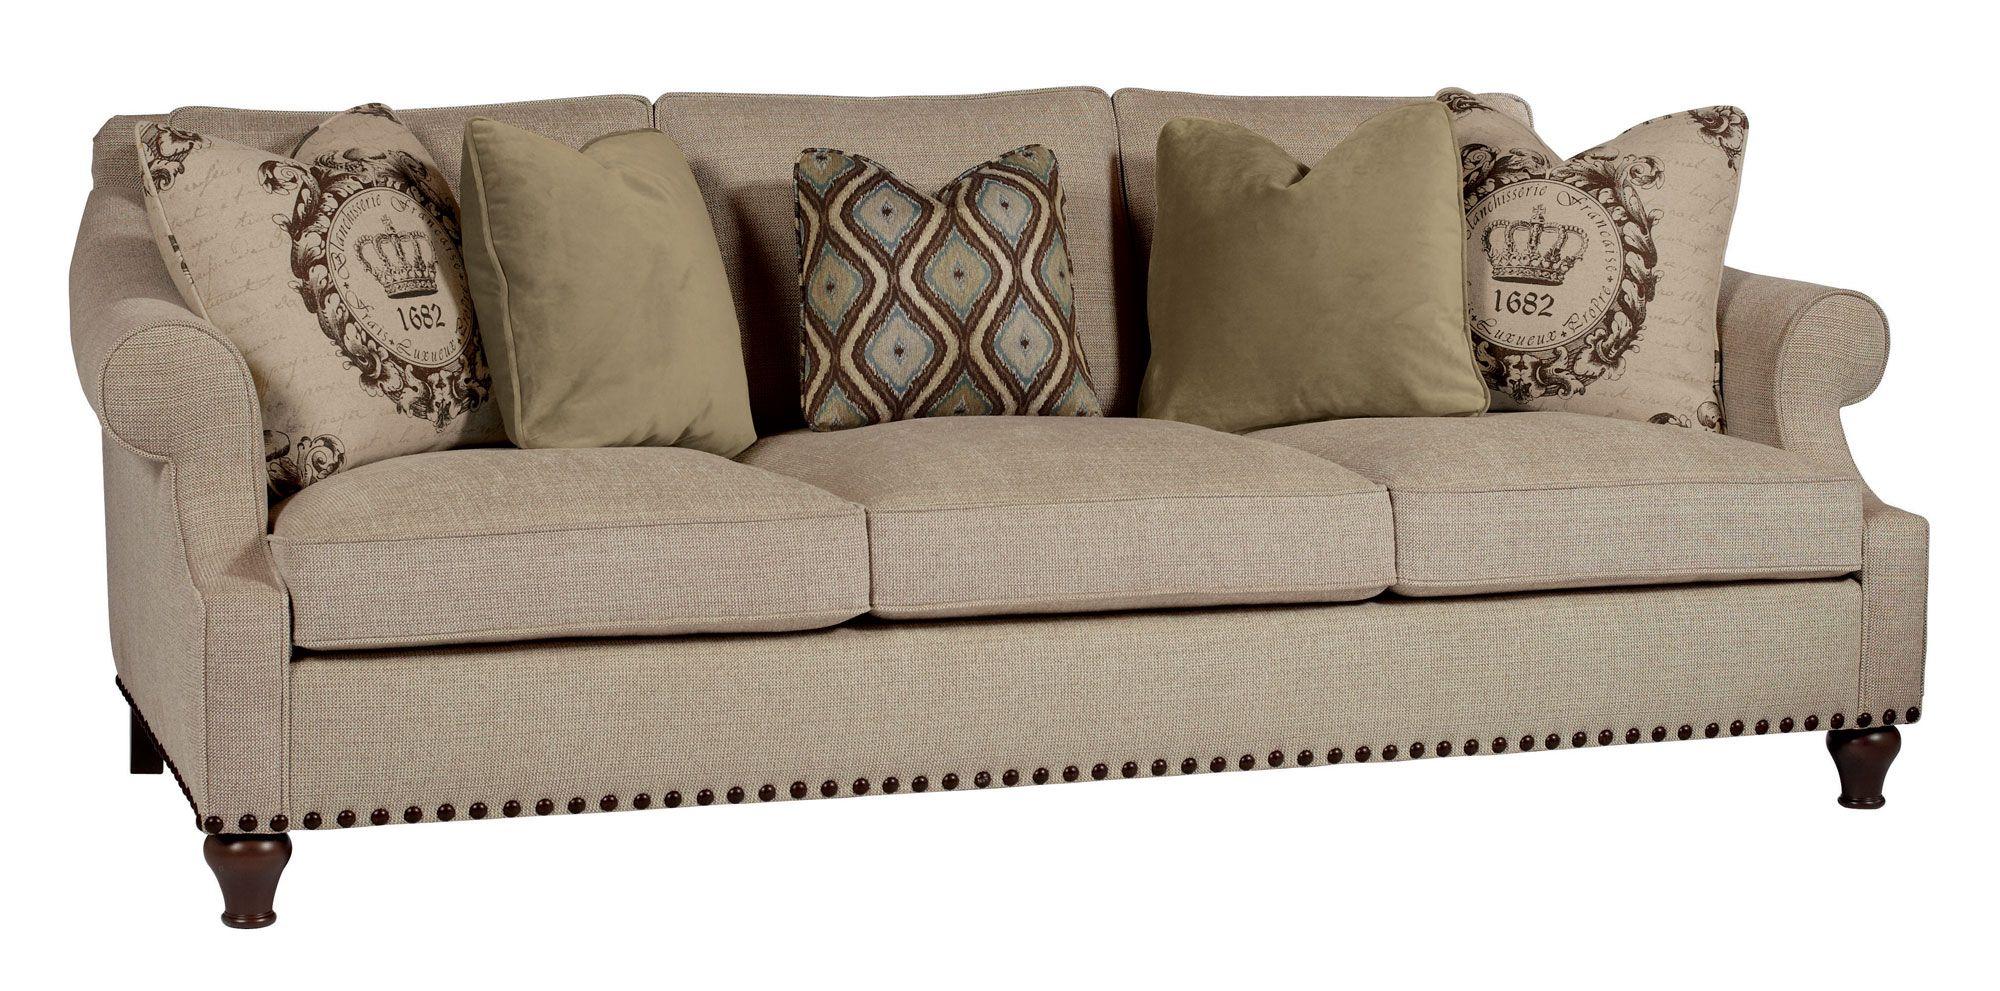 Bernhardt | Harrison Sofa (B3947). I Saw This Sofa At Carsonu0027s Furniture  Store